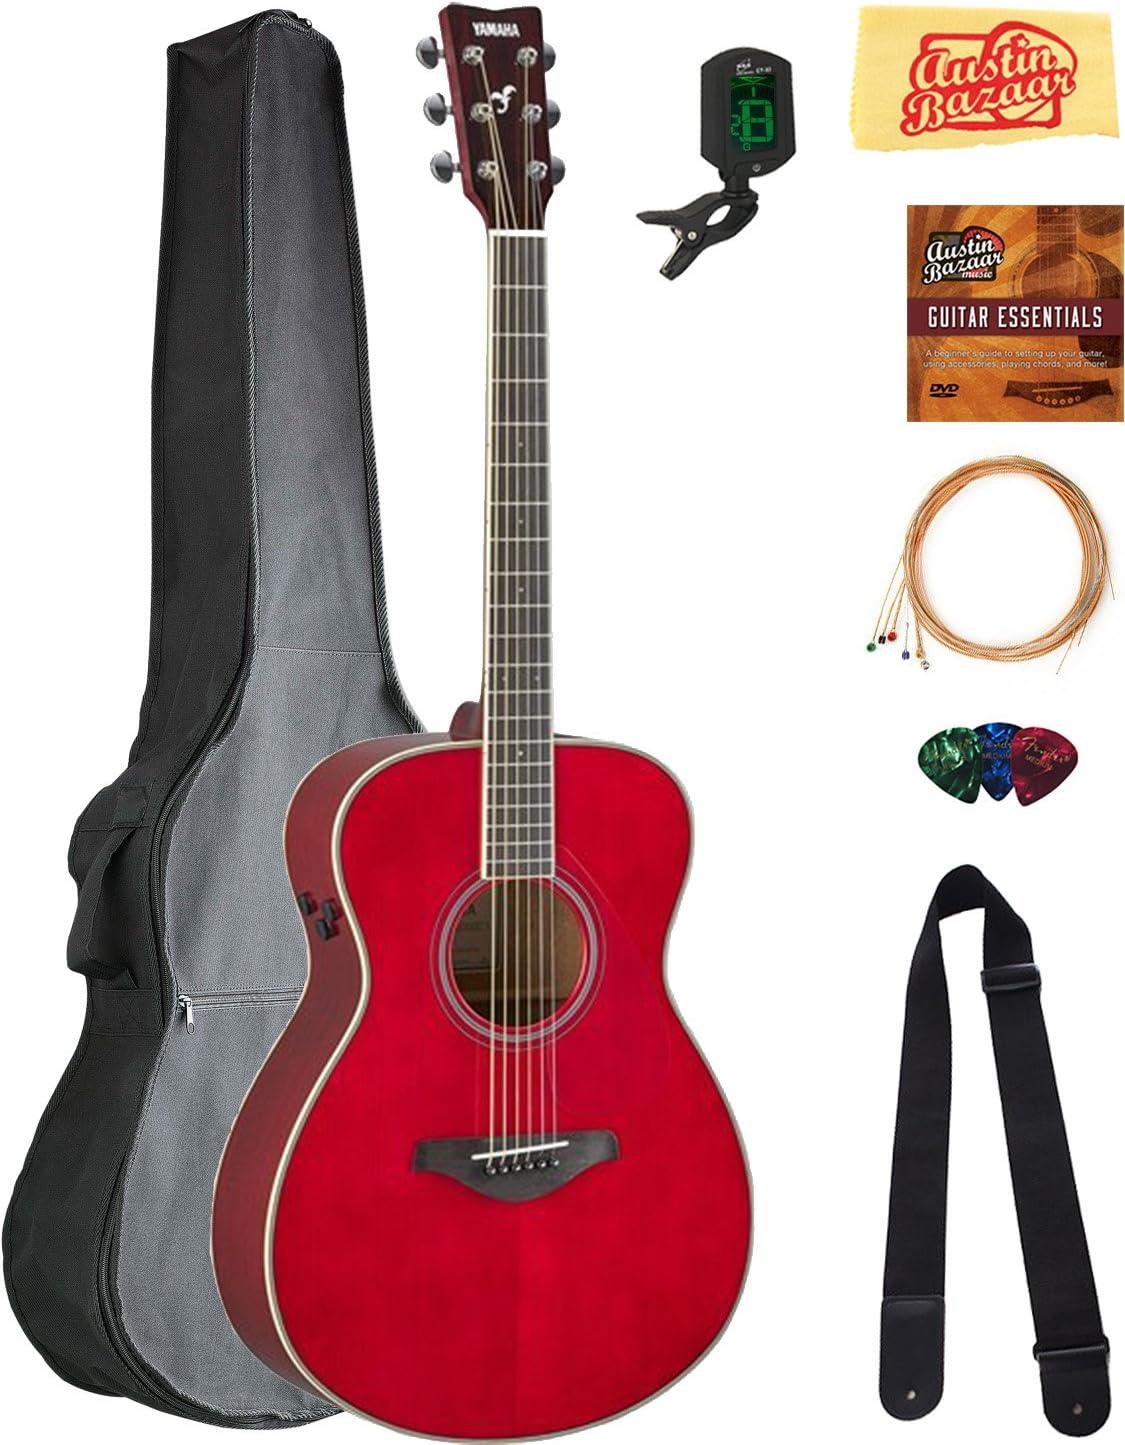 Yamaha FS-TA - Guitarra acústica: Amazon.es: Instrumentos musicales